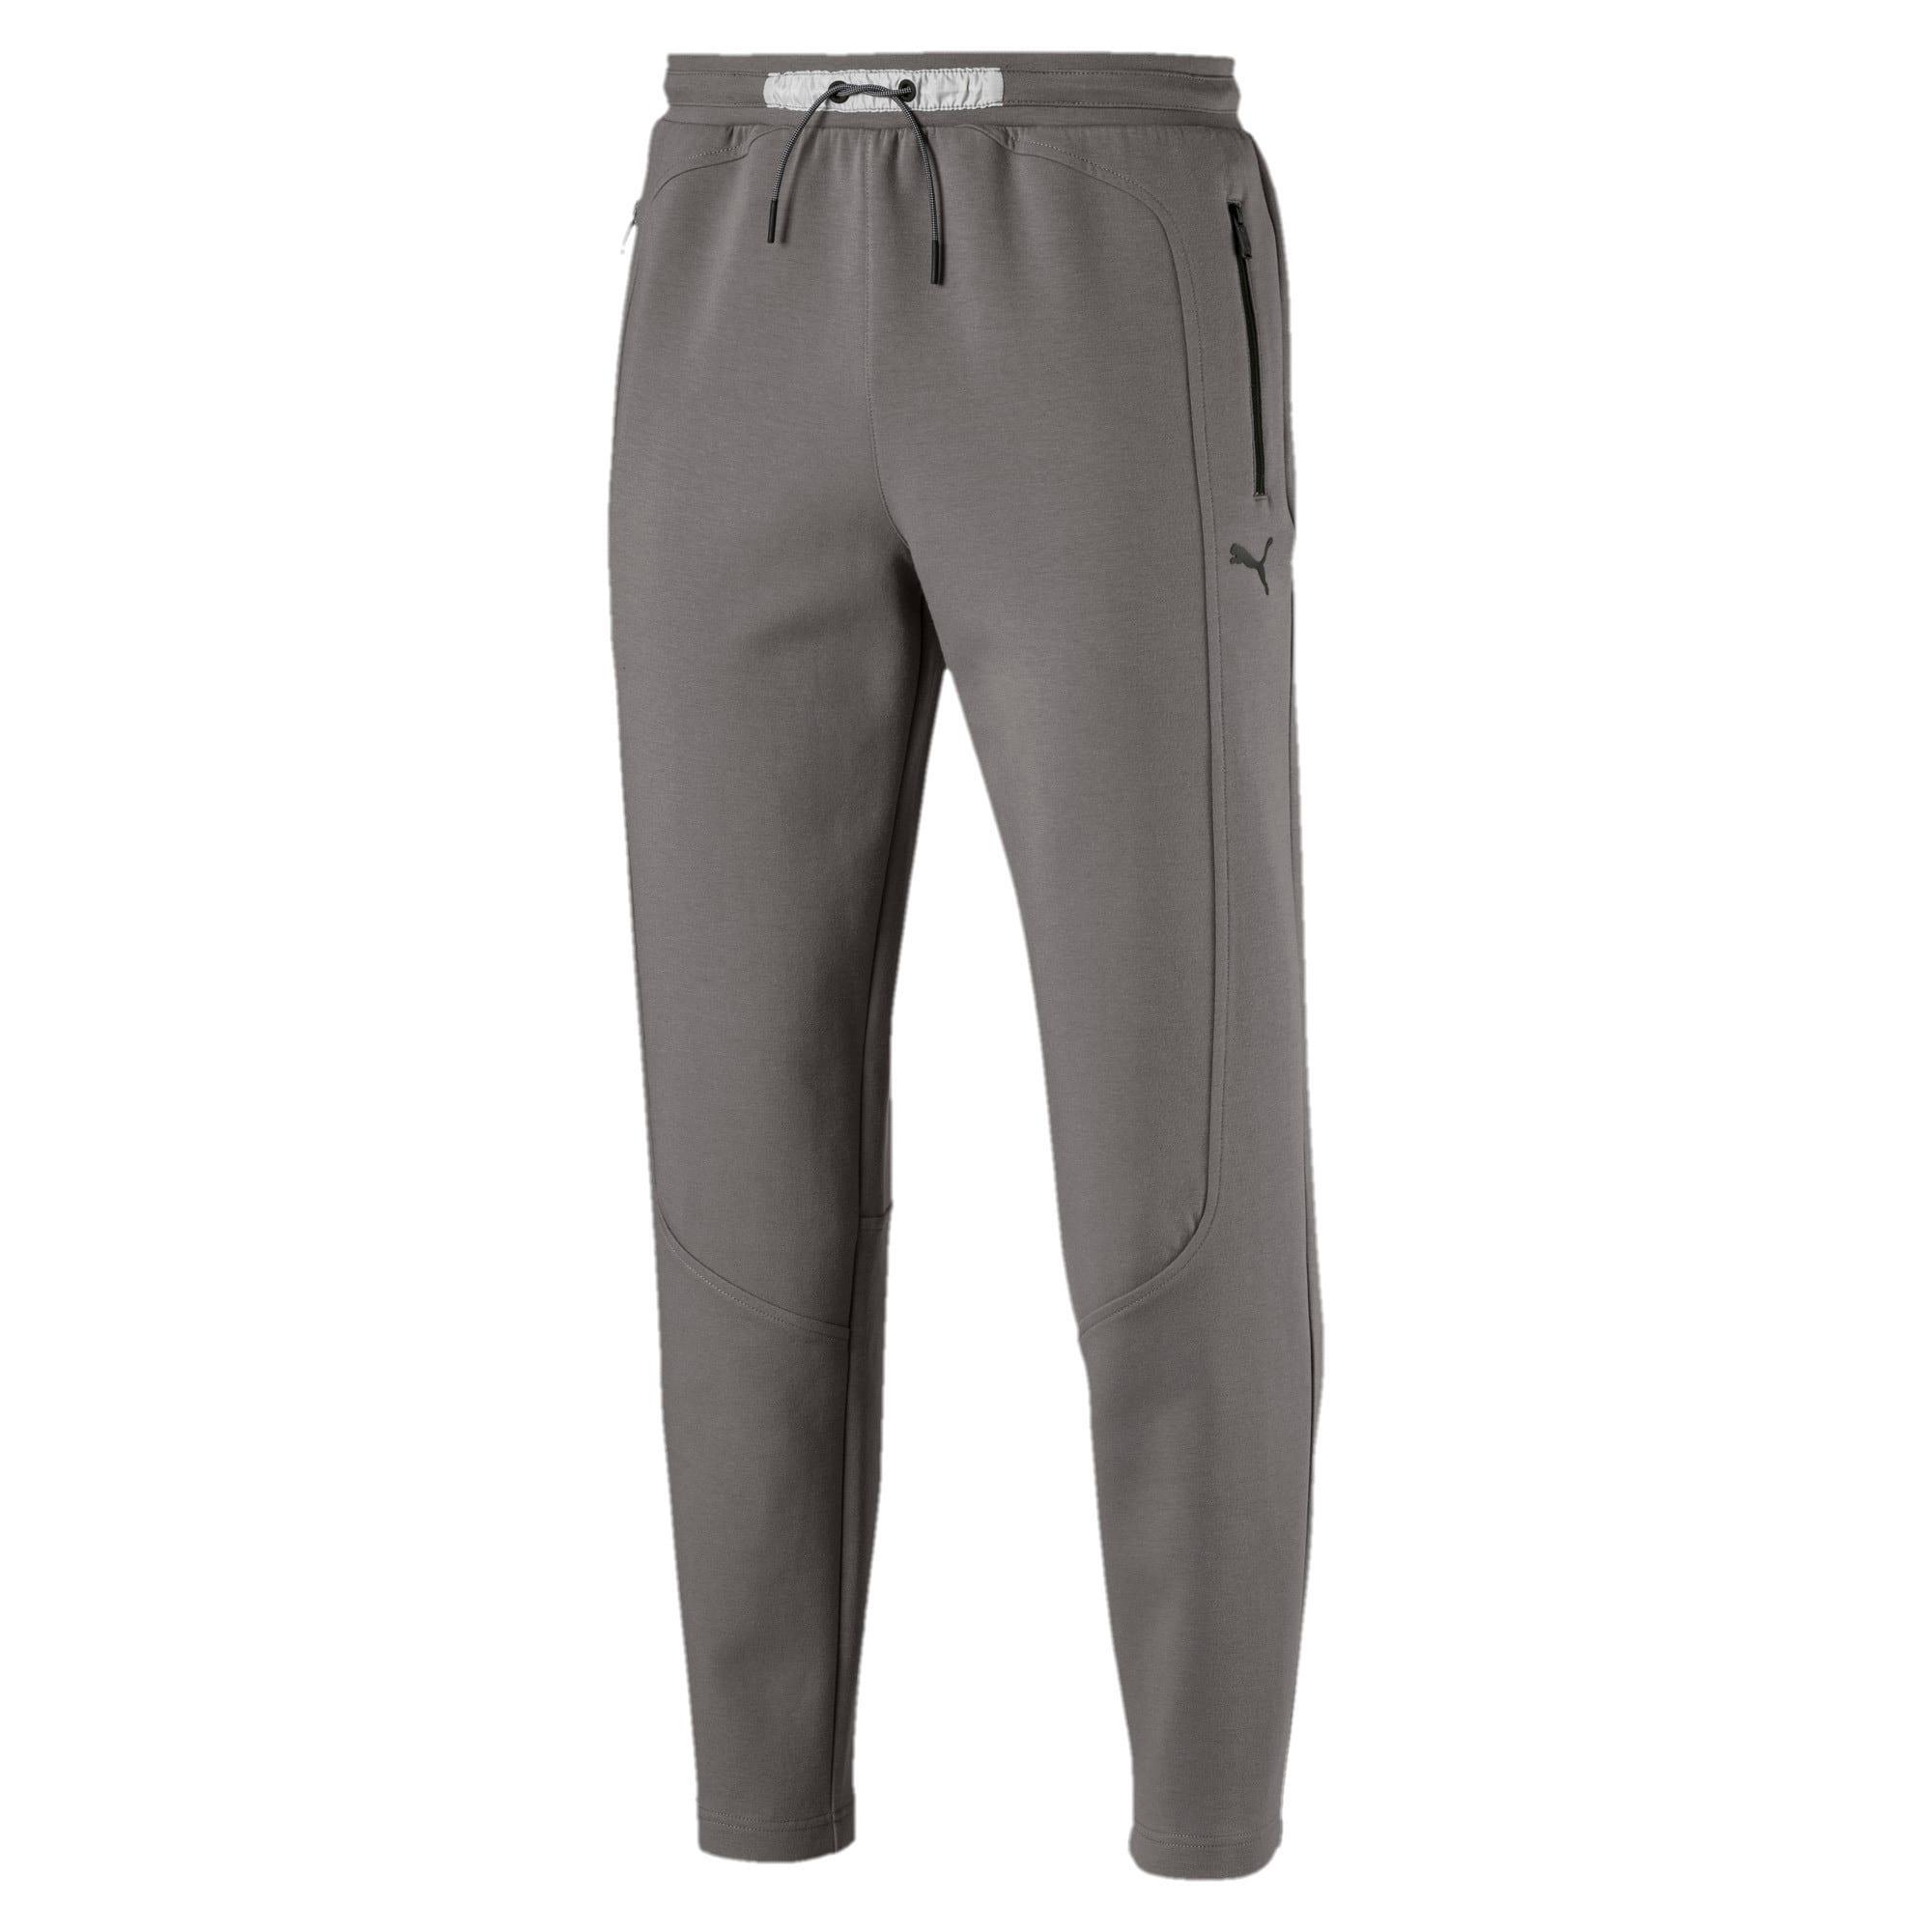 Thumbnail 2 of Ferrari OC Men's Sweat Pants, Charcoal Gray, medium-IND